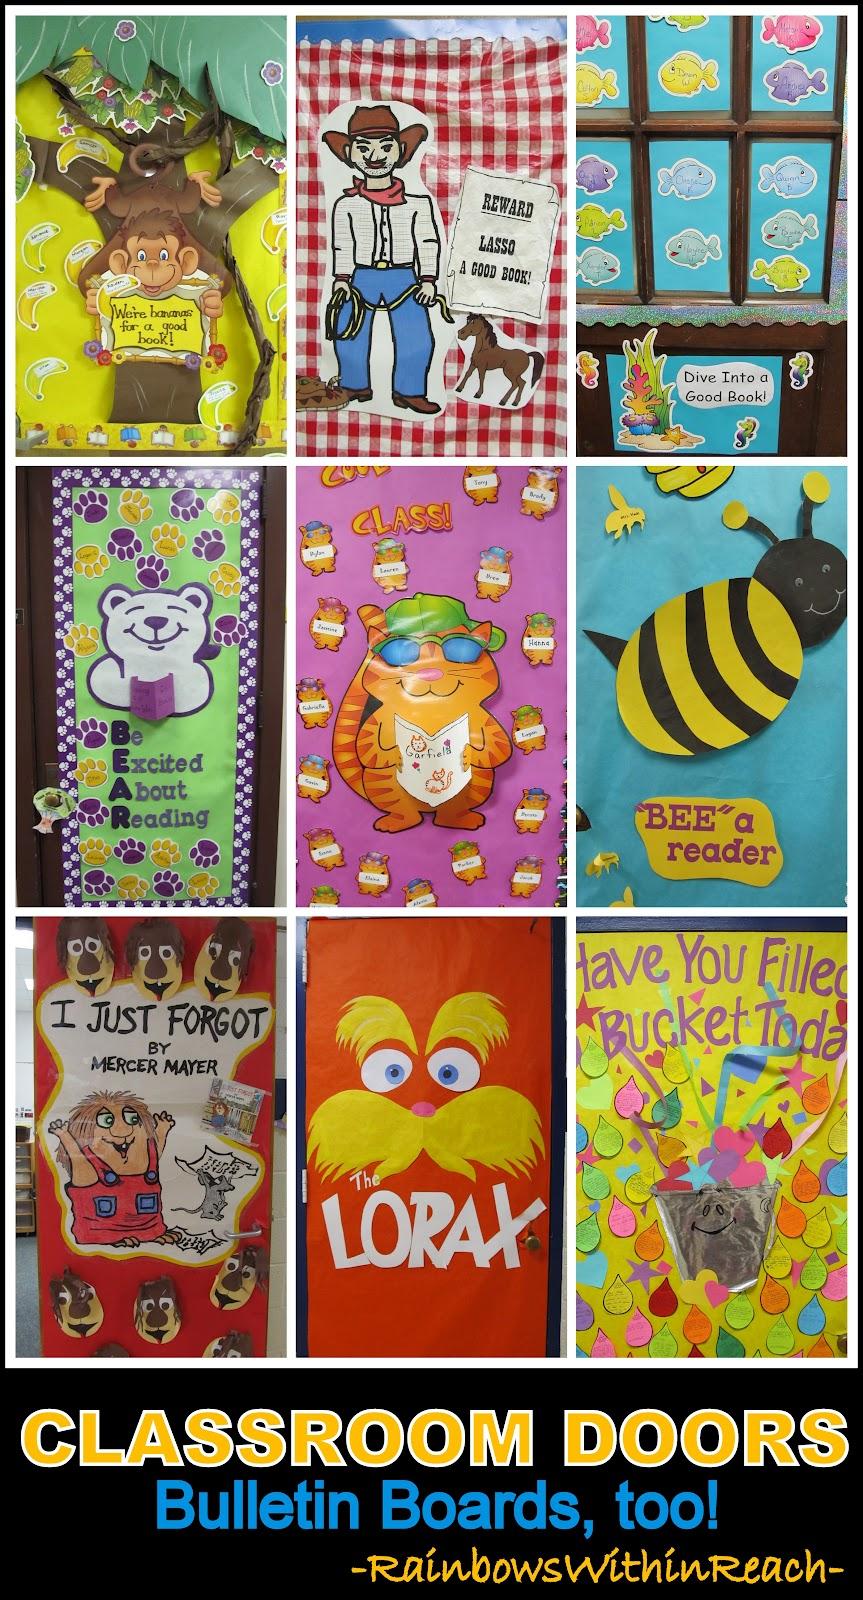 Blog Hoppin': Classroom Organization Vignettes Captured in ...